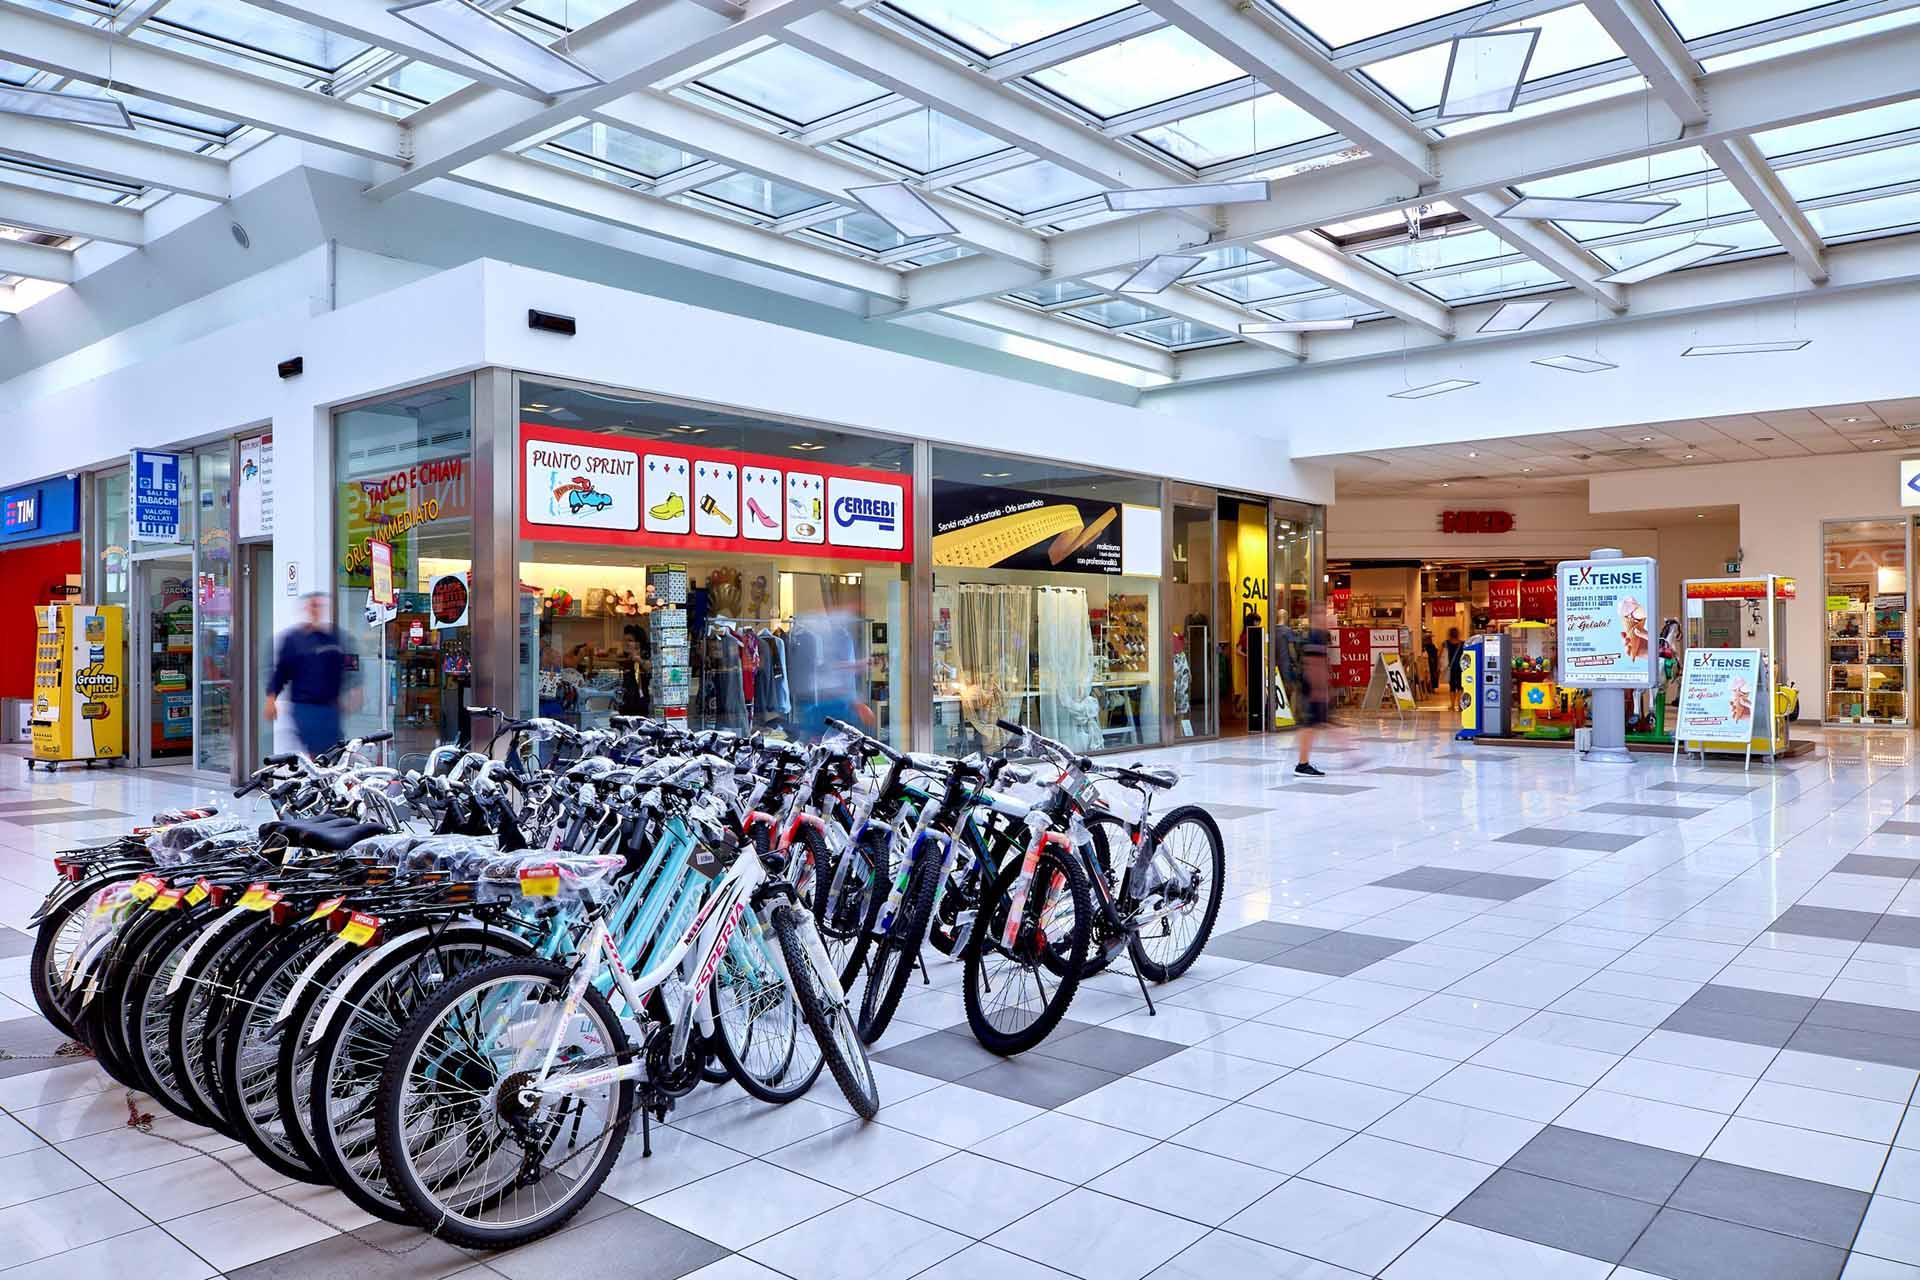 Punto Sprint e Infinity Fashion al Centro Commerciale Extense